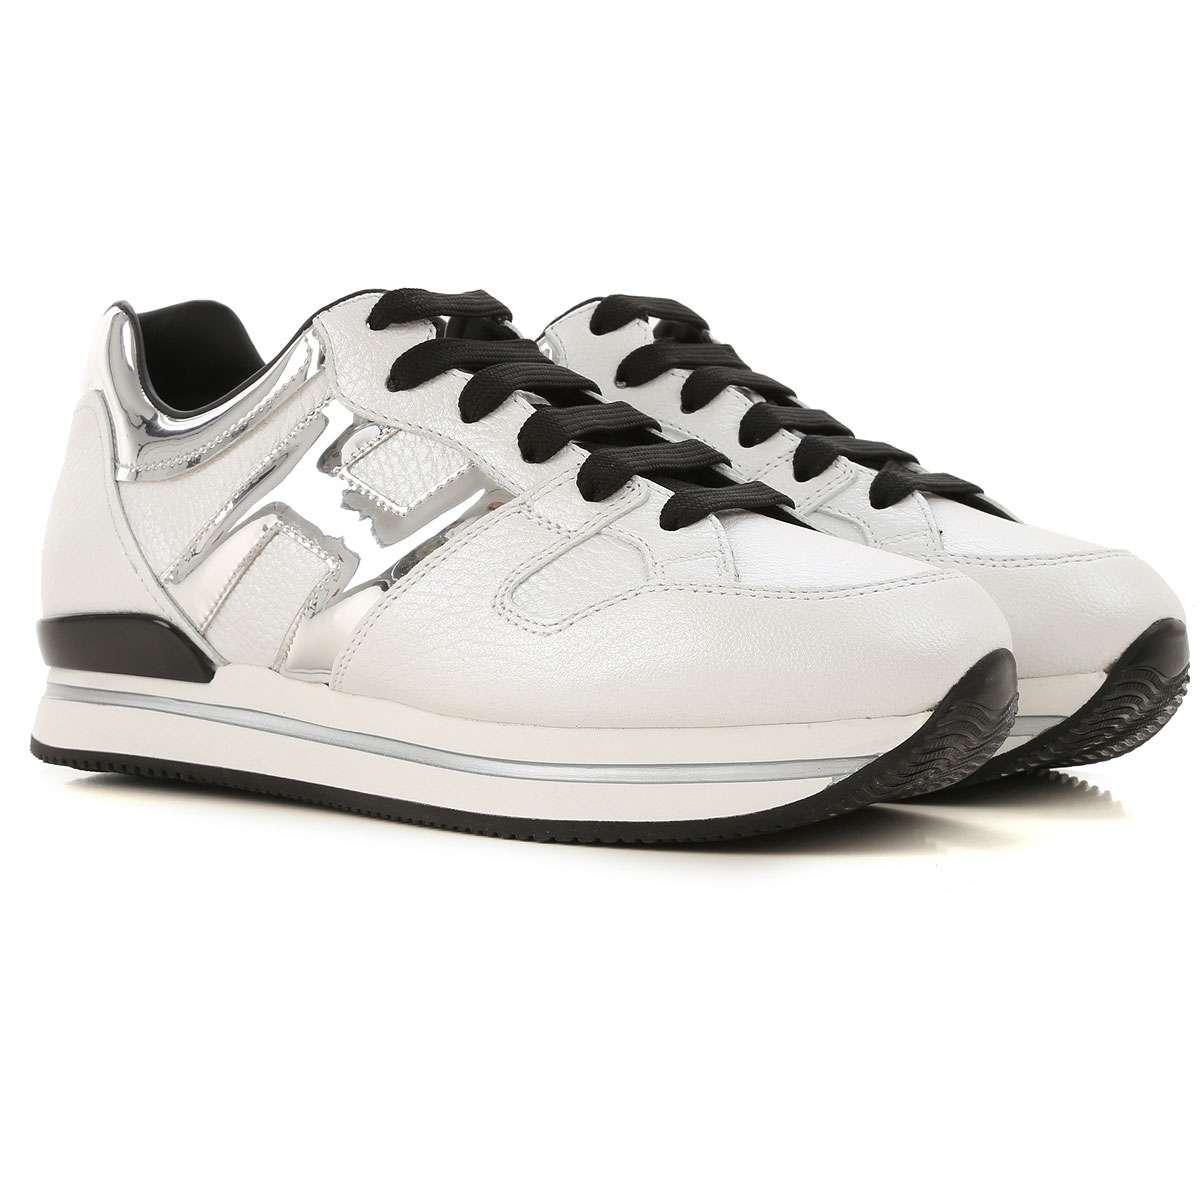 https://www.parmax.com/media/catalog/product/a/i/AI-outlet_parmax-scarpe-donna-Hogan-hxw2220t548ljz0351-B.jpg